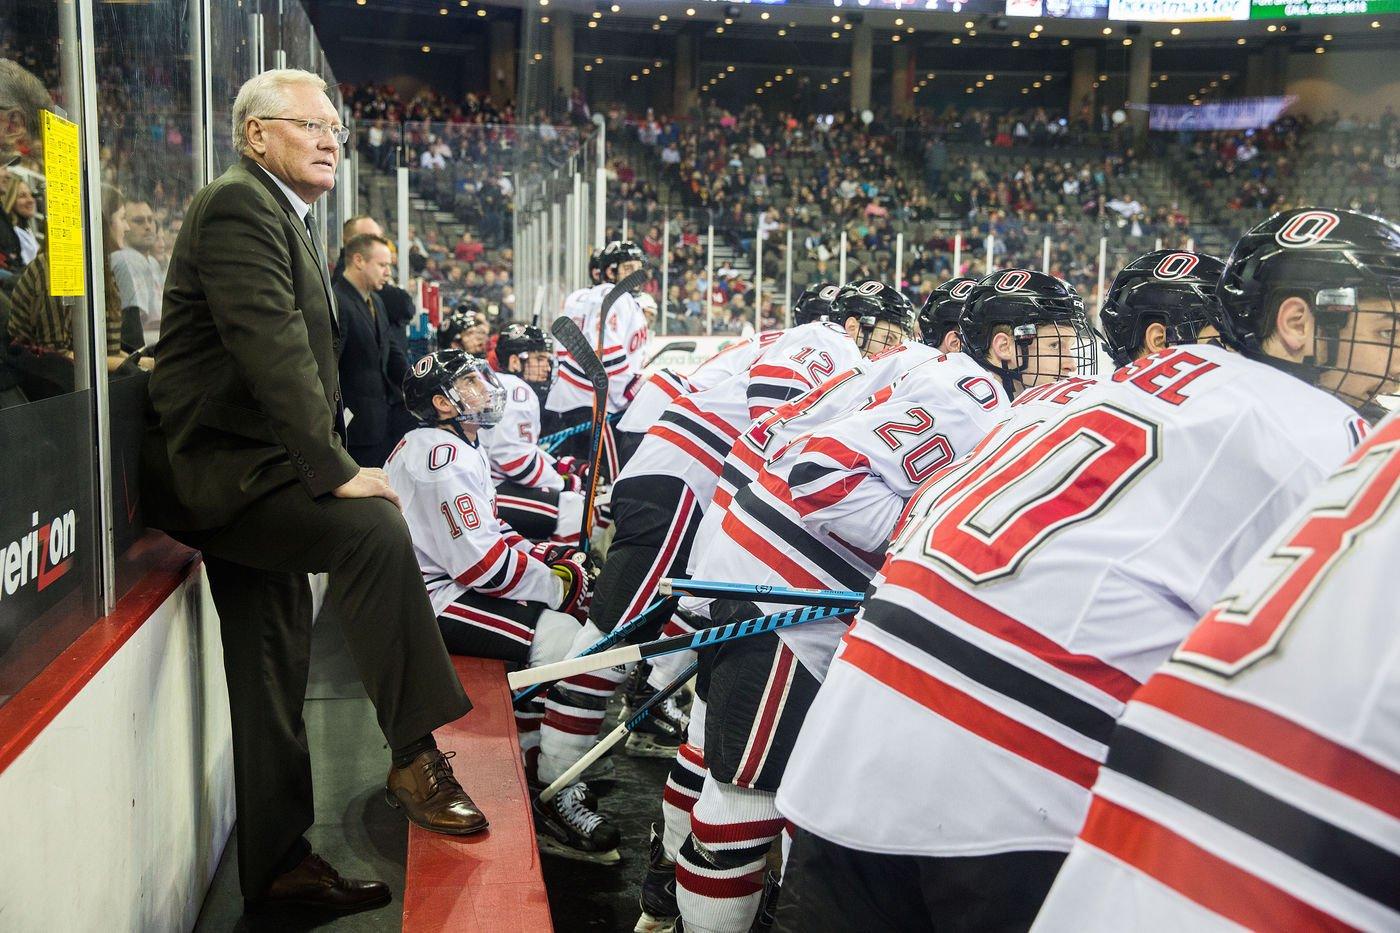 NCAA: UNO Hockey To Face Harvard In Regional